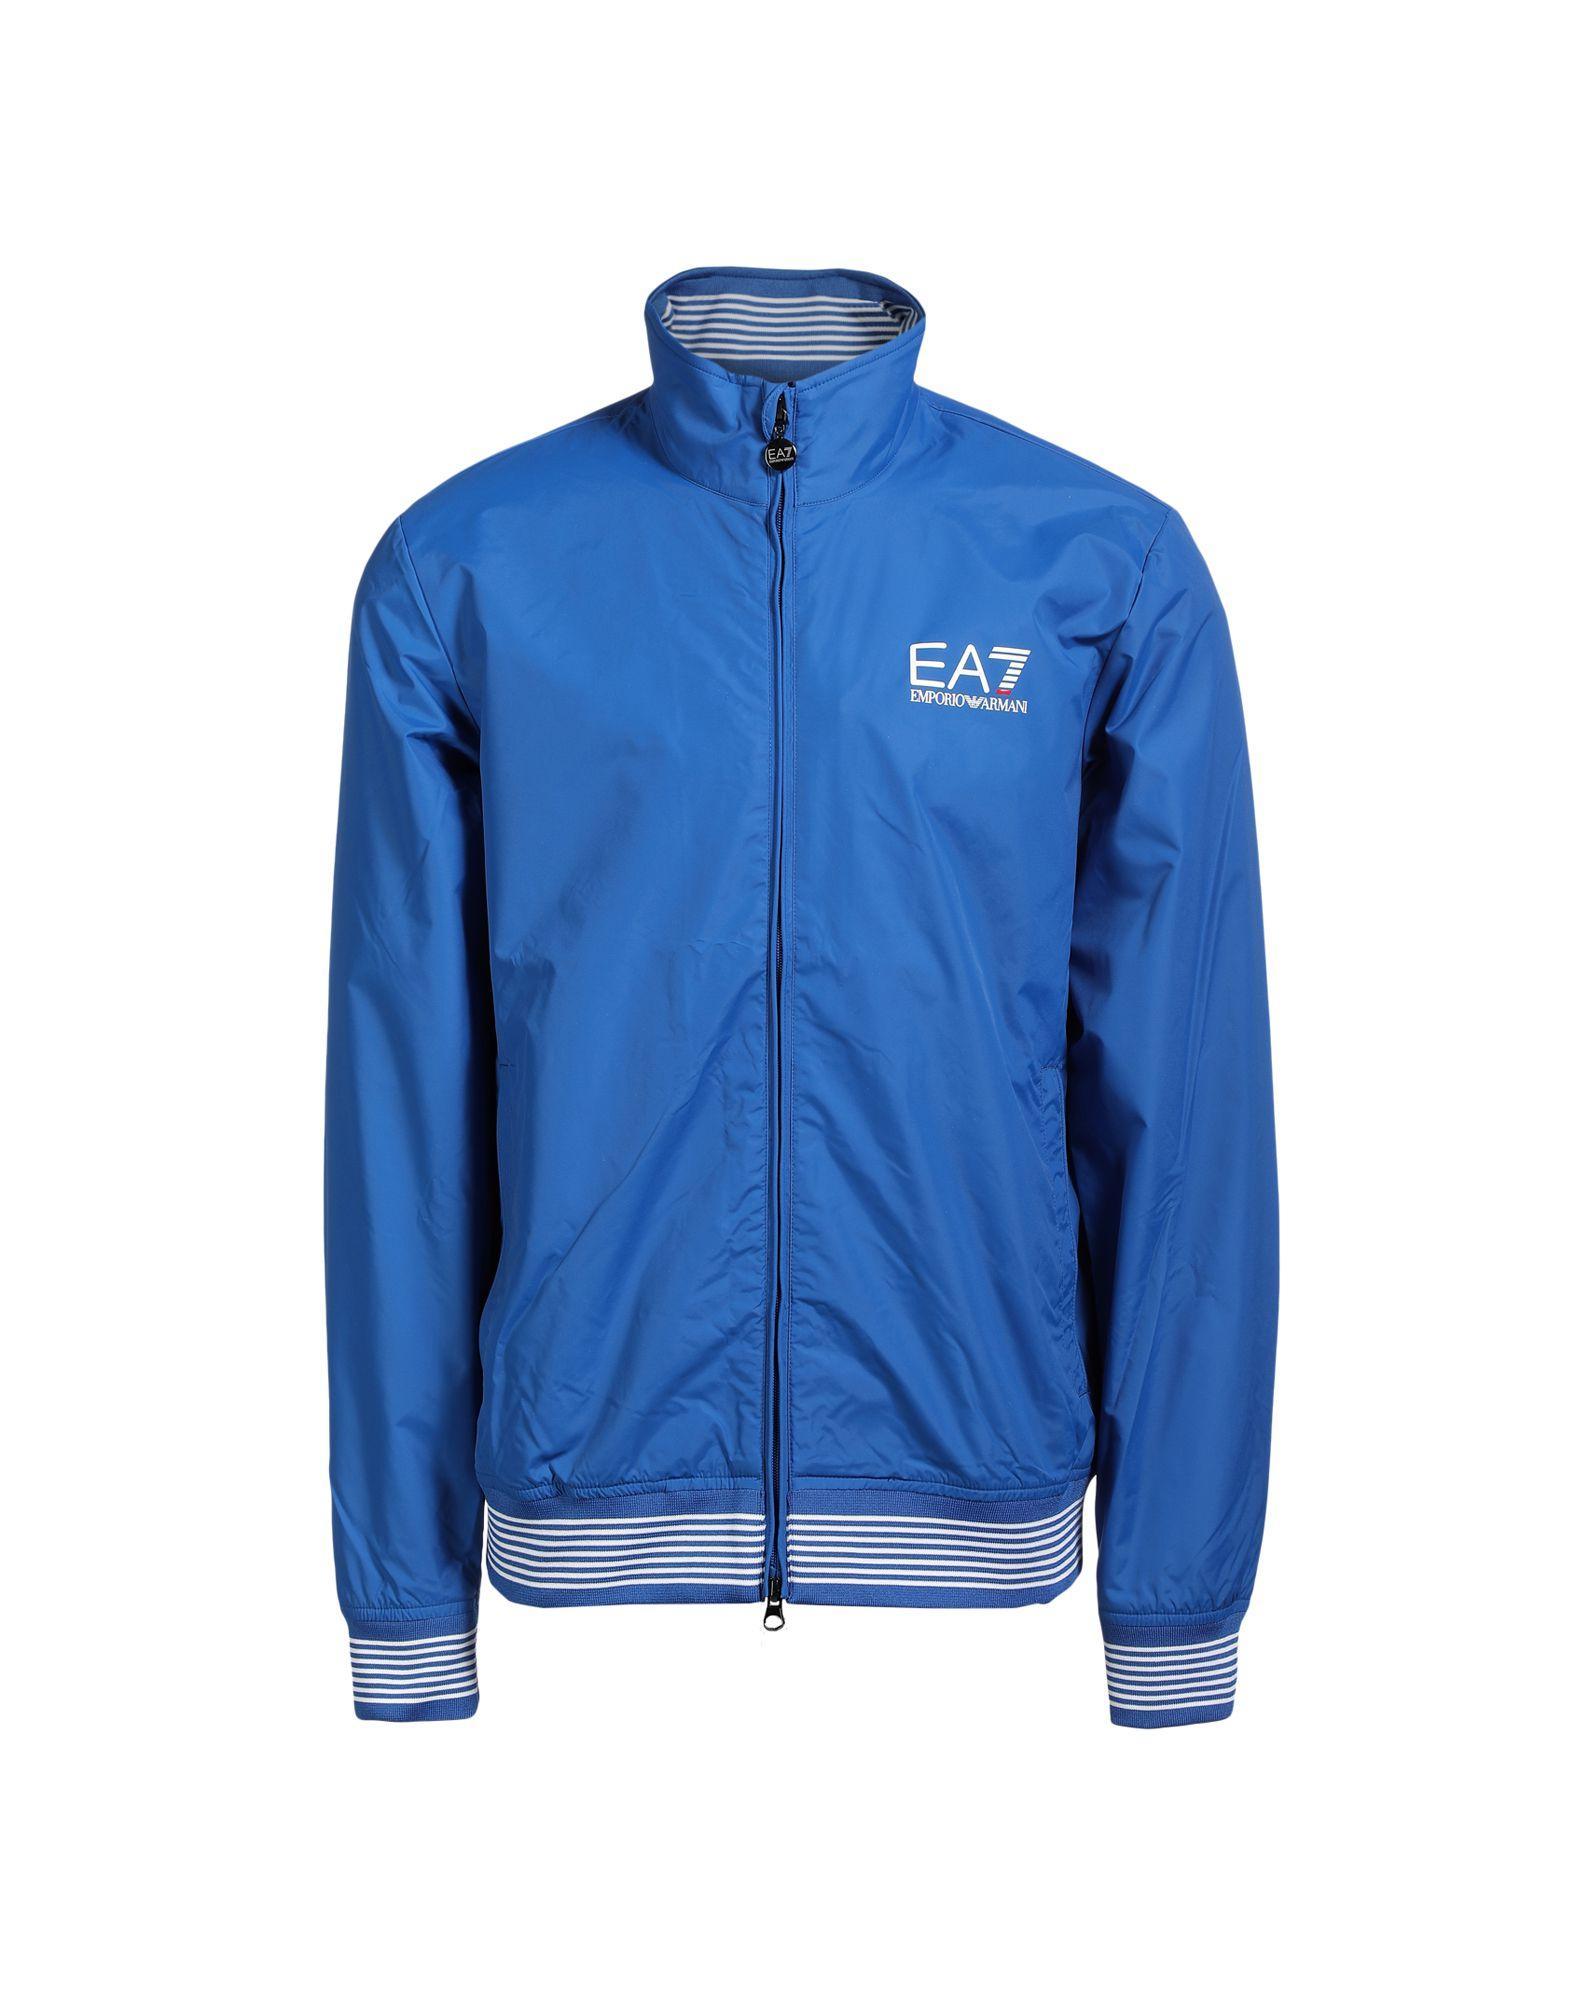 Emporio Armani Jackets In Bright Blue